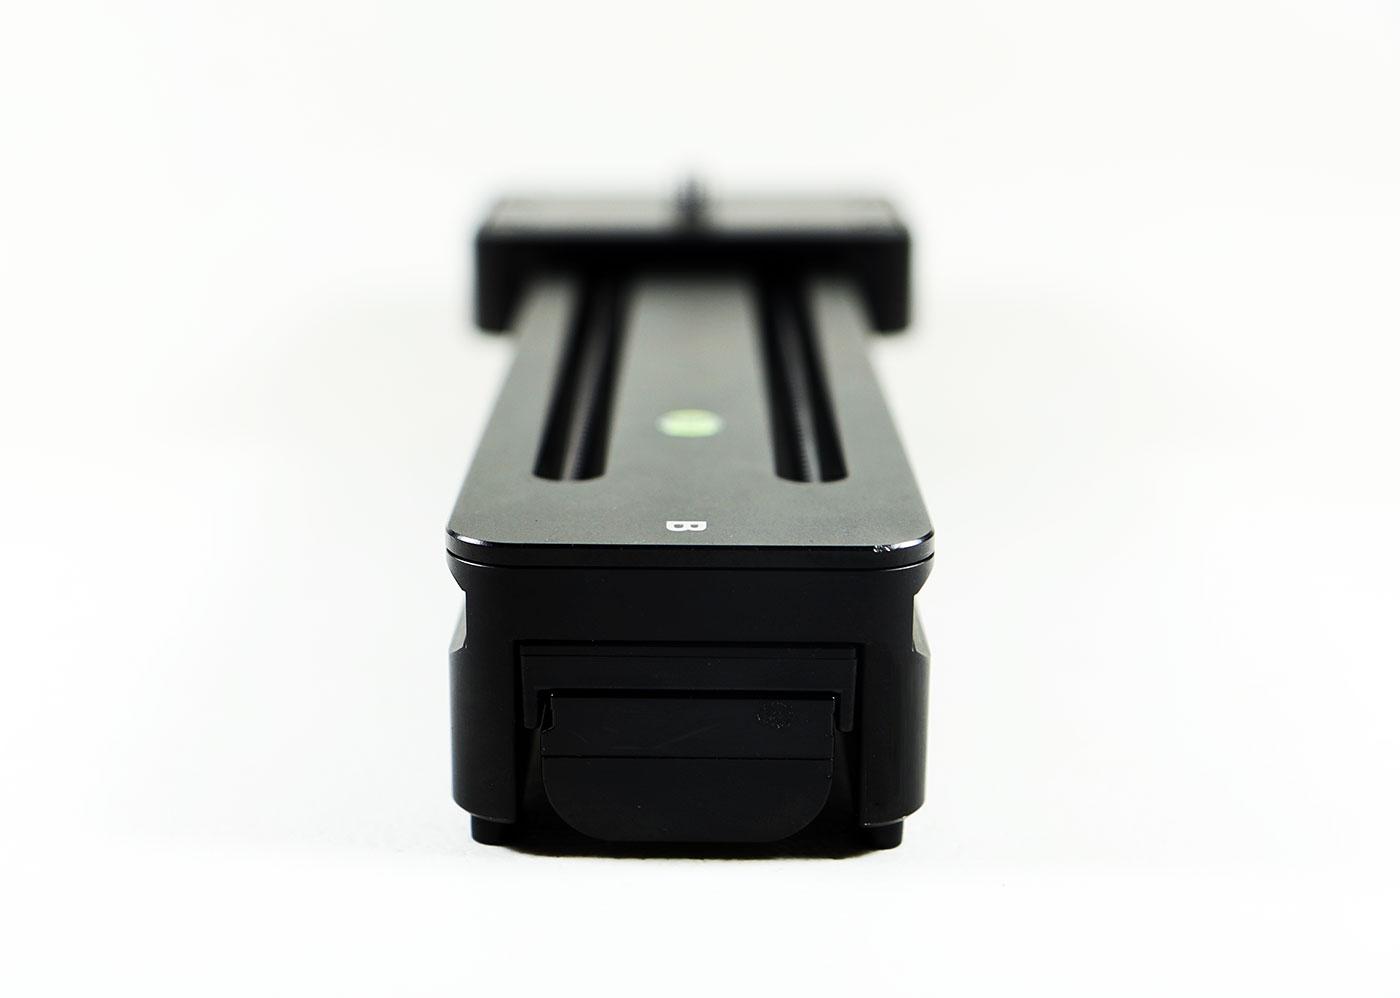 Edelkrone SliderOne Pro